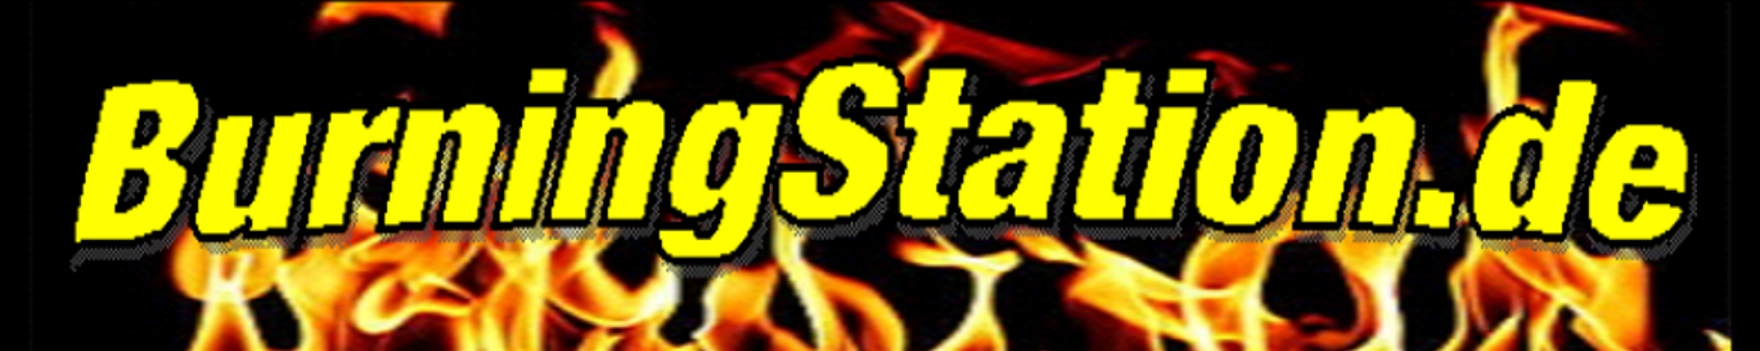 BurningStation News